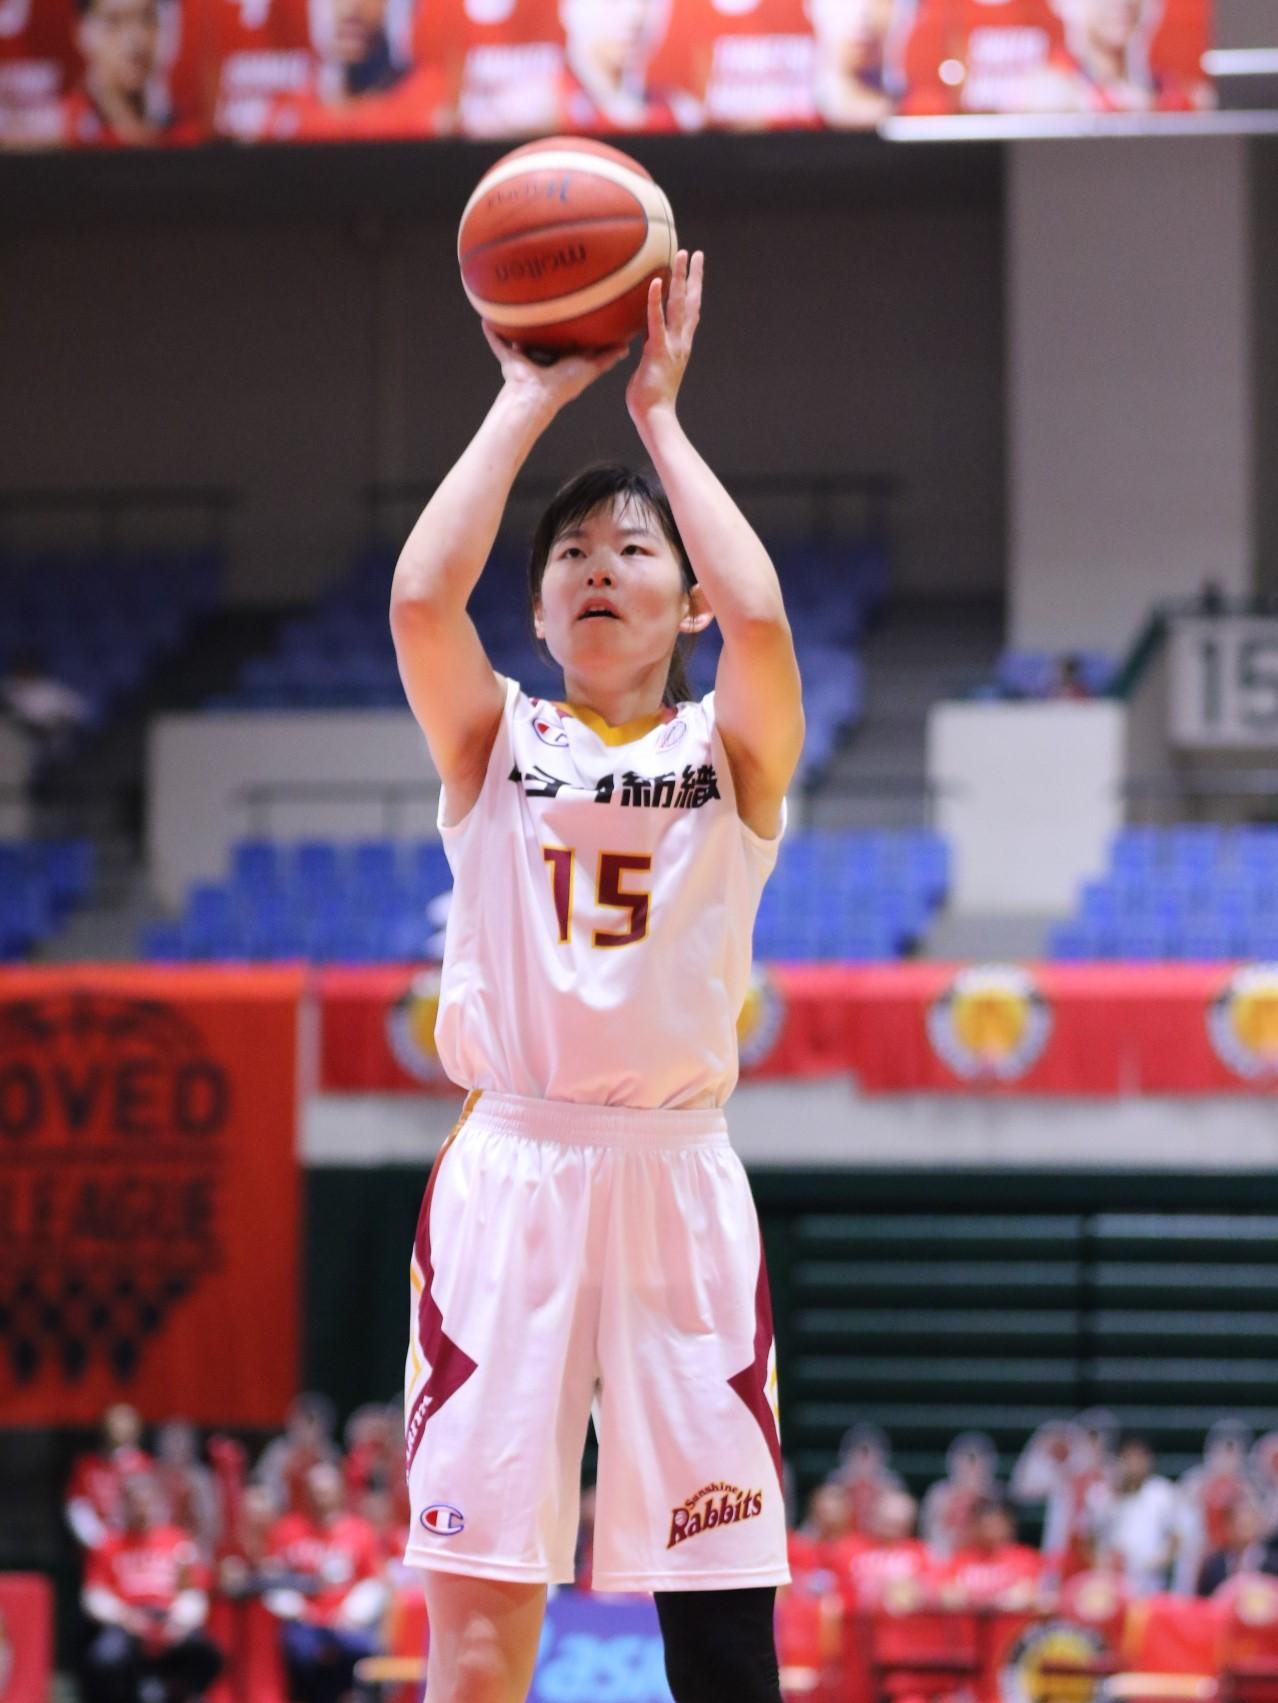 15 加藤優希 Yuki Kato